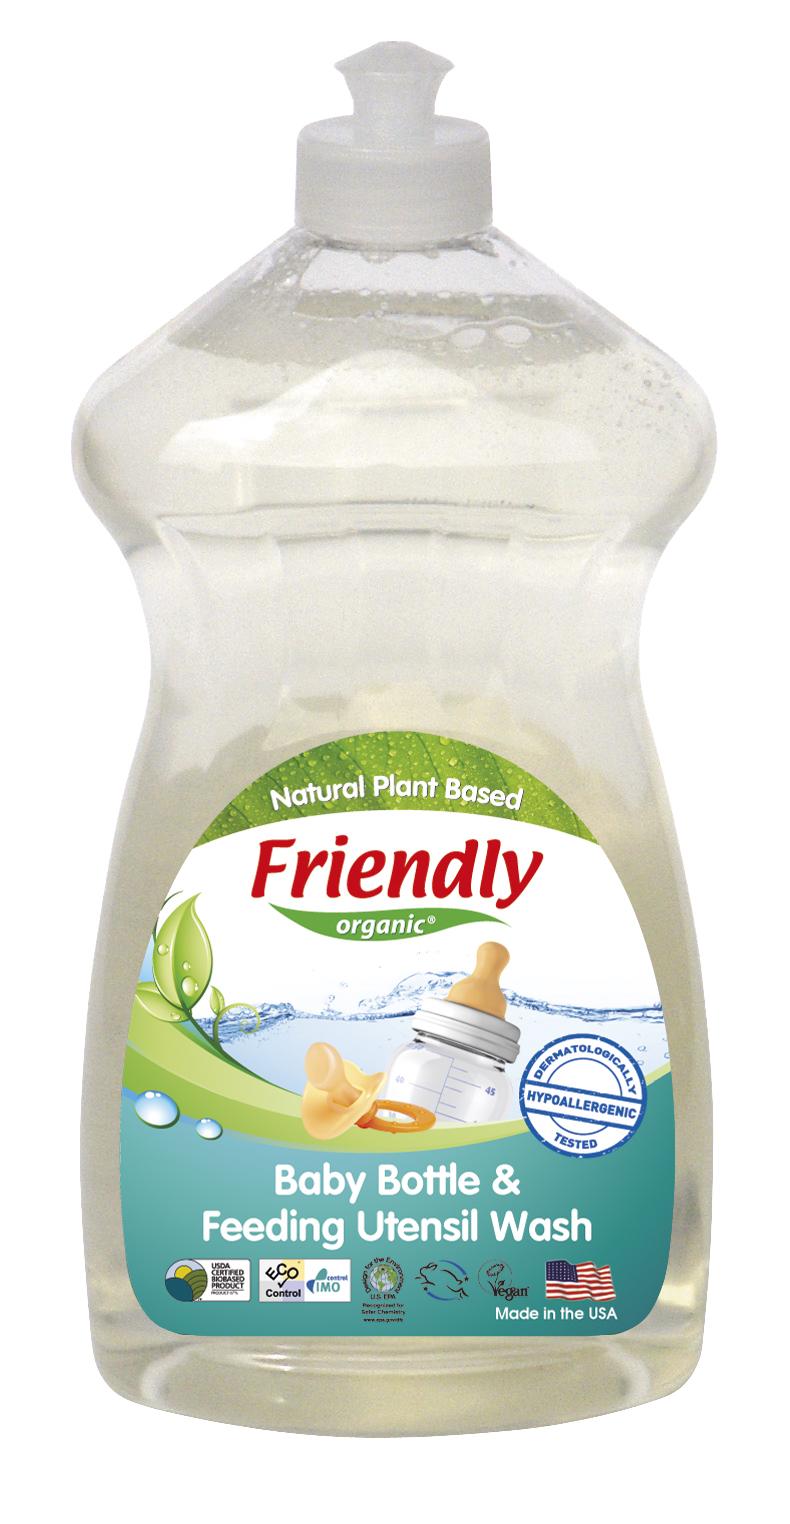 Friendly Organics Baby Bottle & Feeding Utensil Wash - Fregrance Free (750ml)